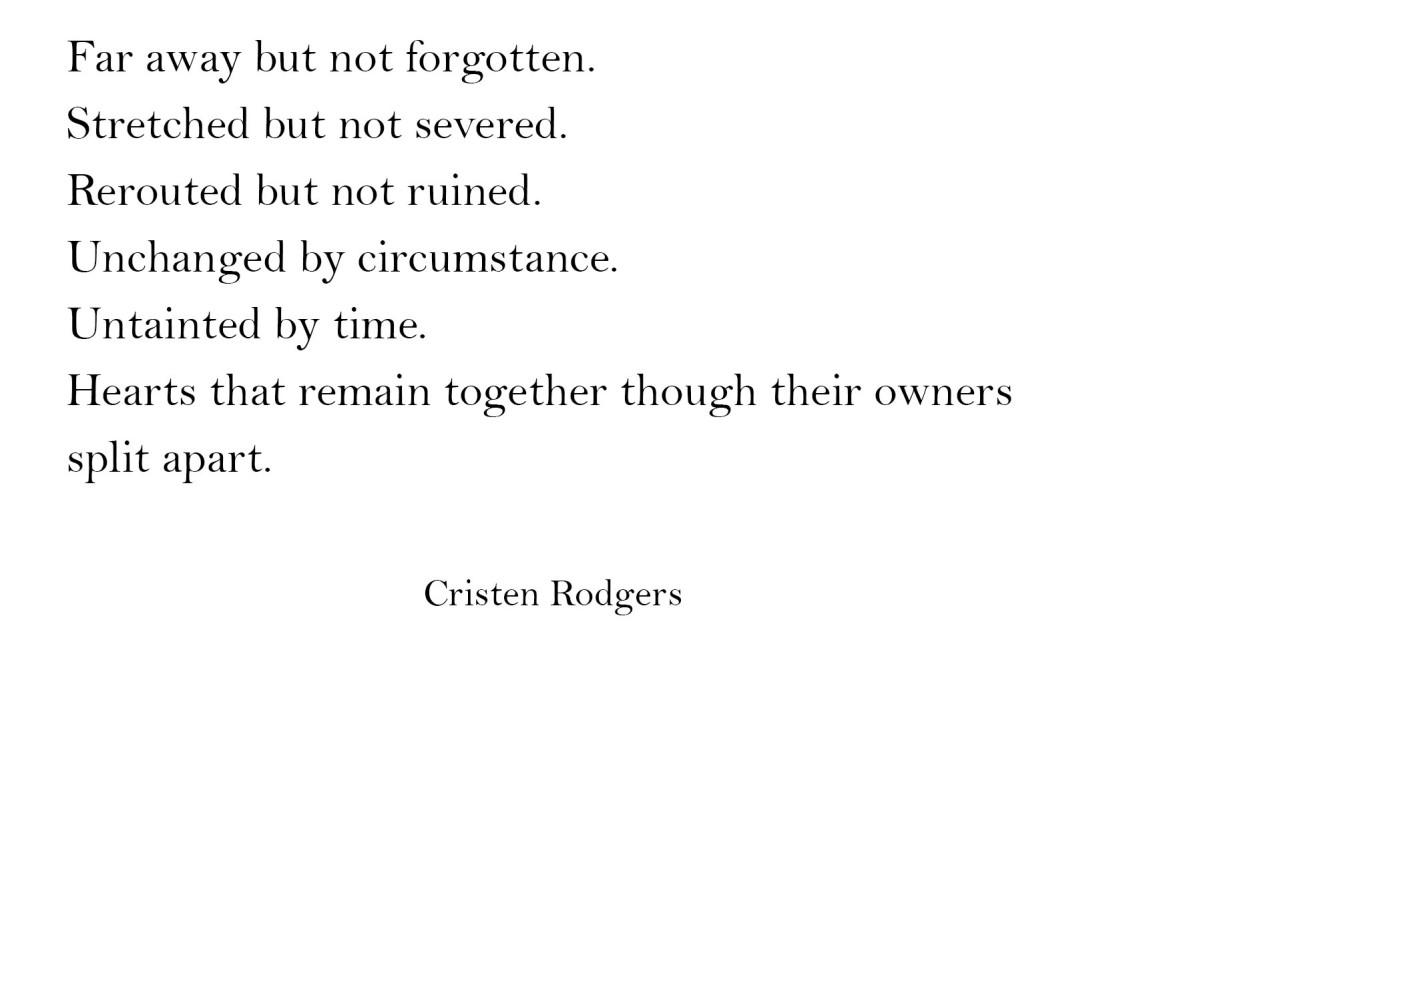 cristen rodgers quotes